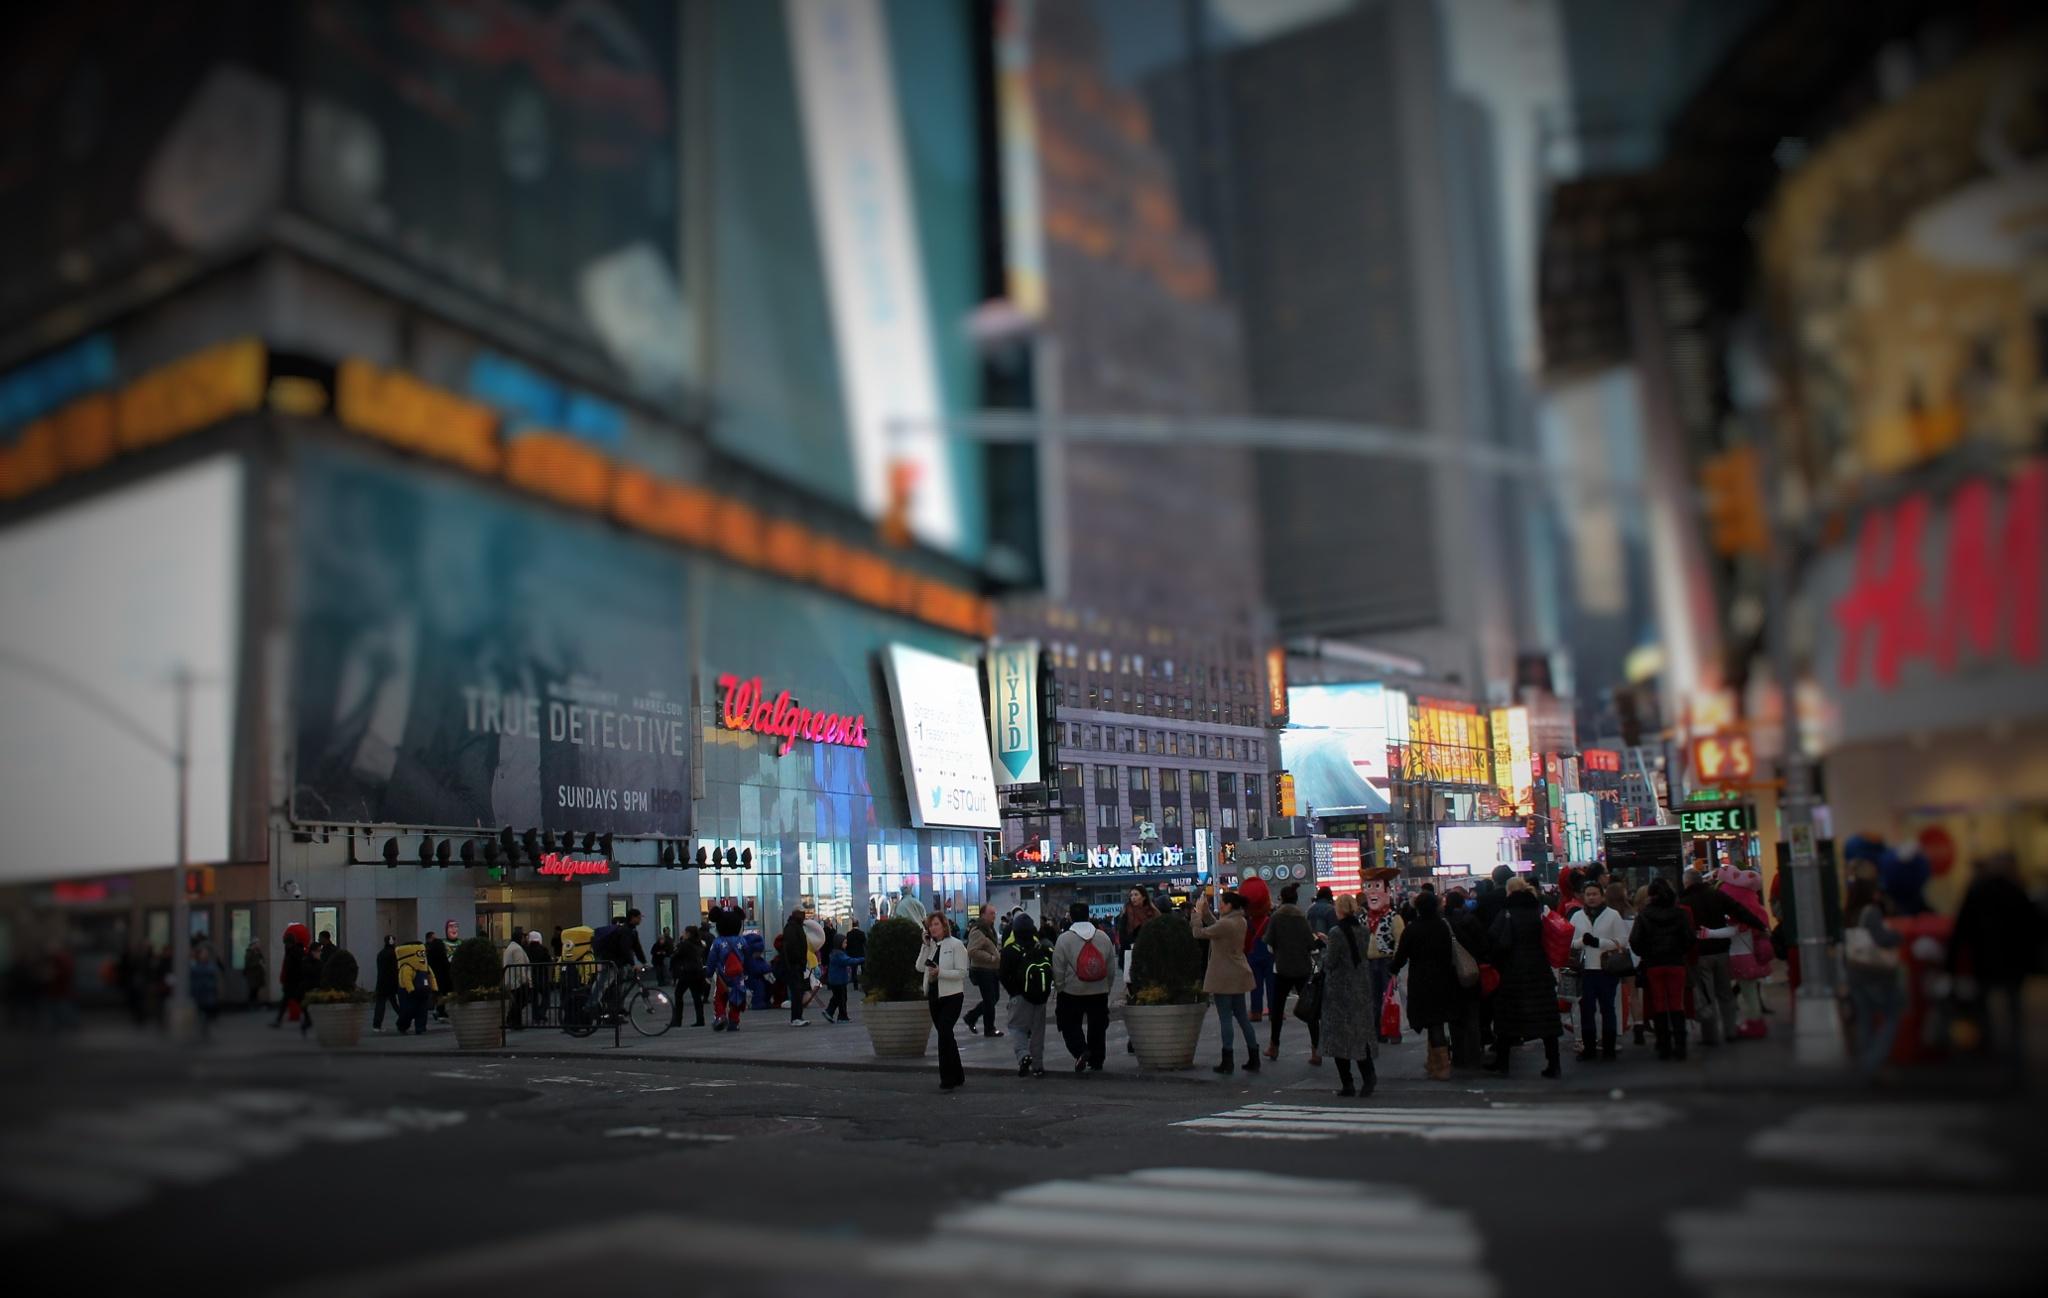 WALGREEN on Times Square, by Liborio Drogo